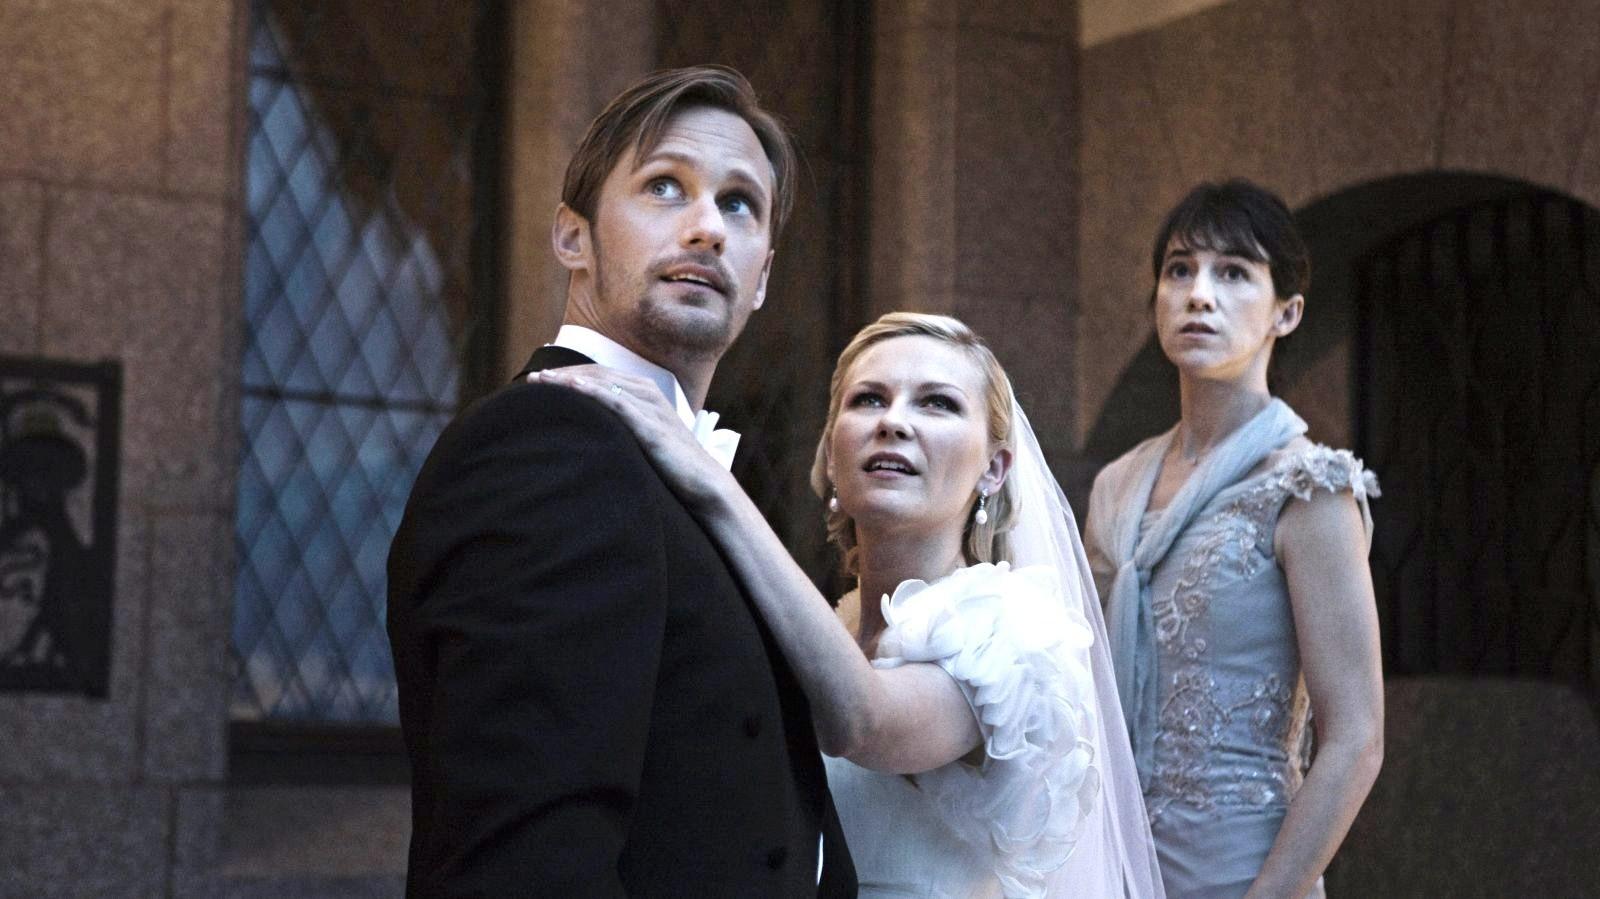 http://1.bp.blogspot.com/-T6tWuyhEmcs/TprmKcZzshI/AAAAAAAAGOA/xIwCNE5TyCc/s1600/melancholia-movie-Kirsten-Dunst_Alexander-Skarsgard_Charlotte-Gainsbourg-16.jpg